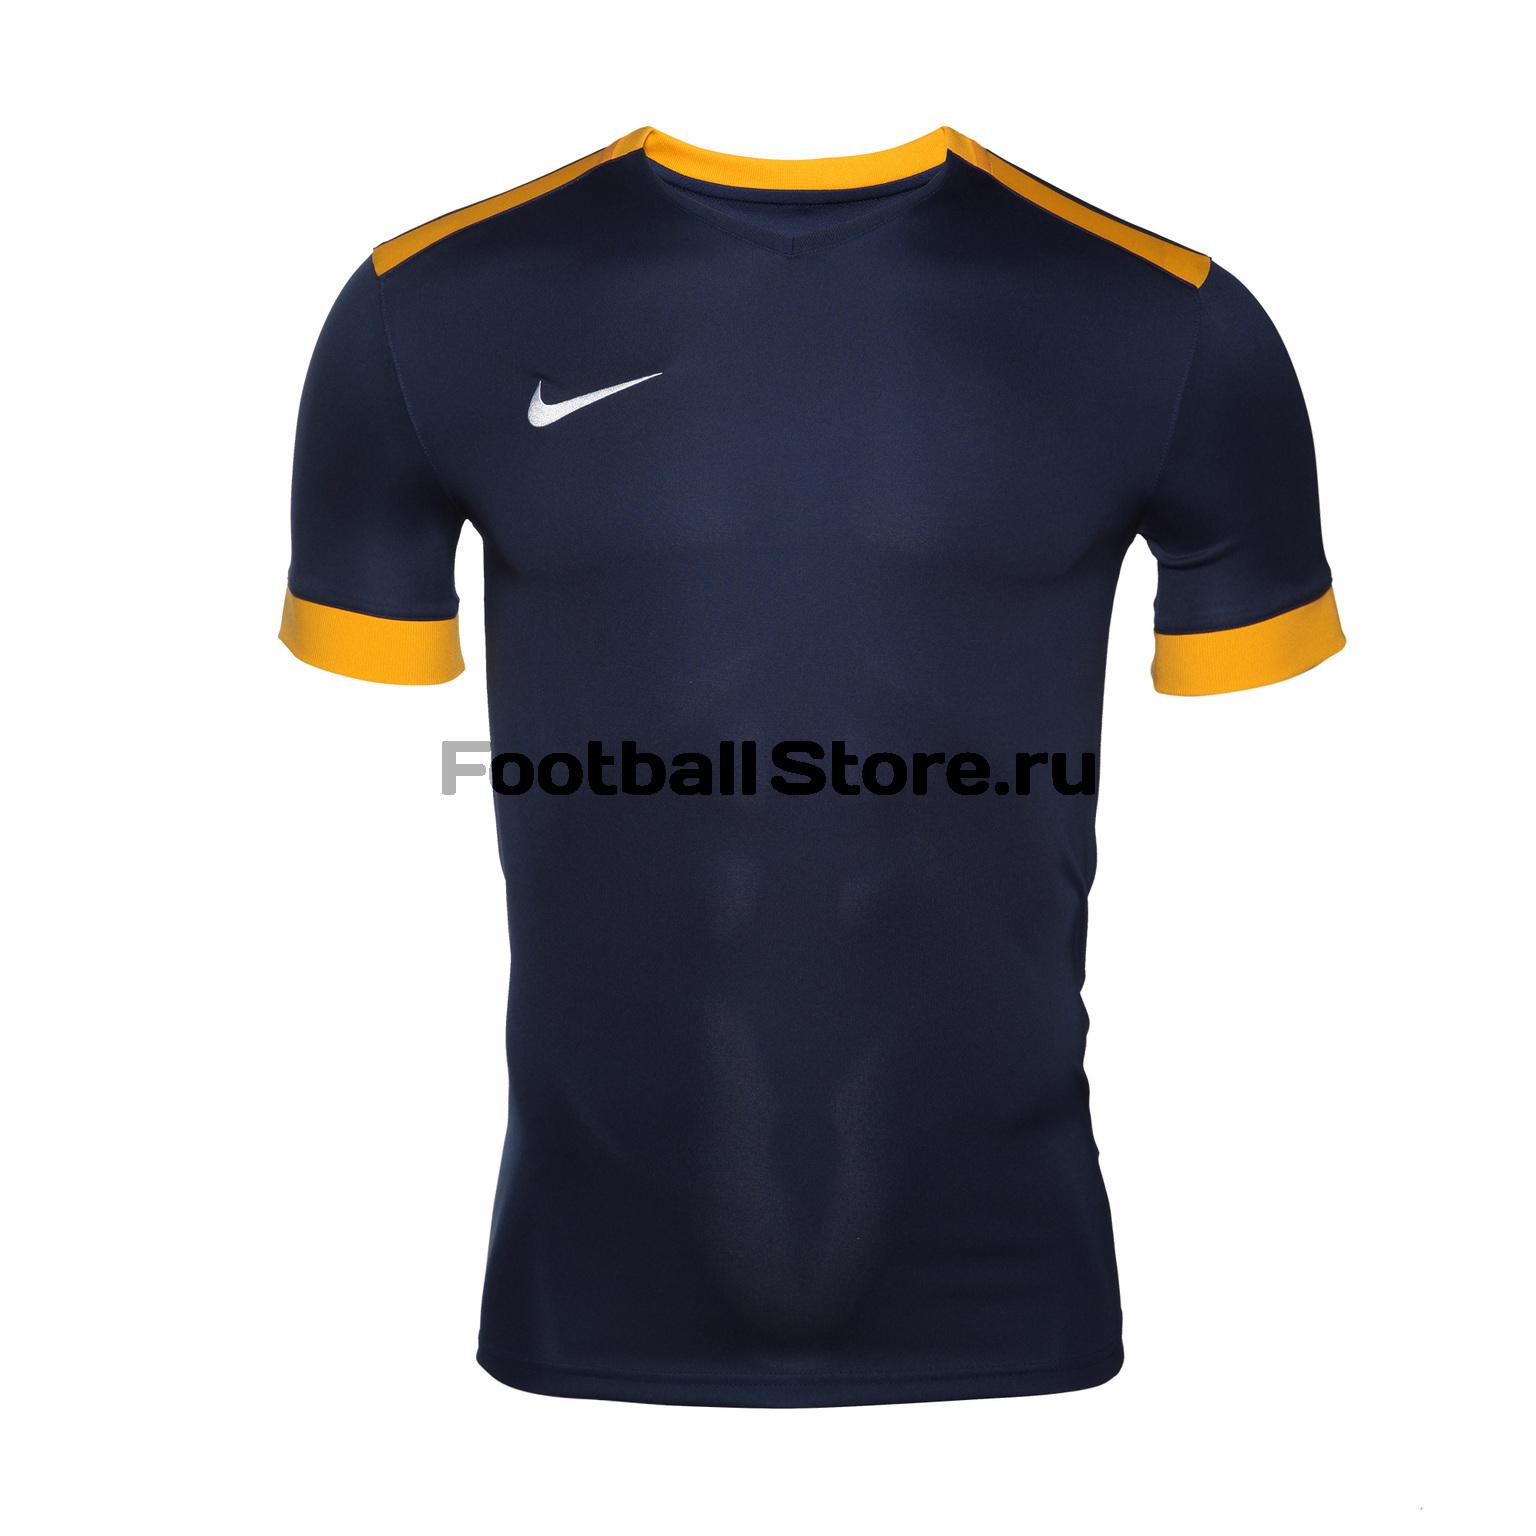 Футболка игровая Nike Park Derby II JSY SS 894312-410 футболка игровая nike ls park derby jsy 588414 106